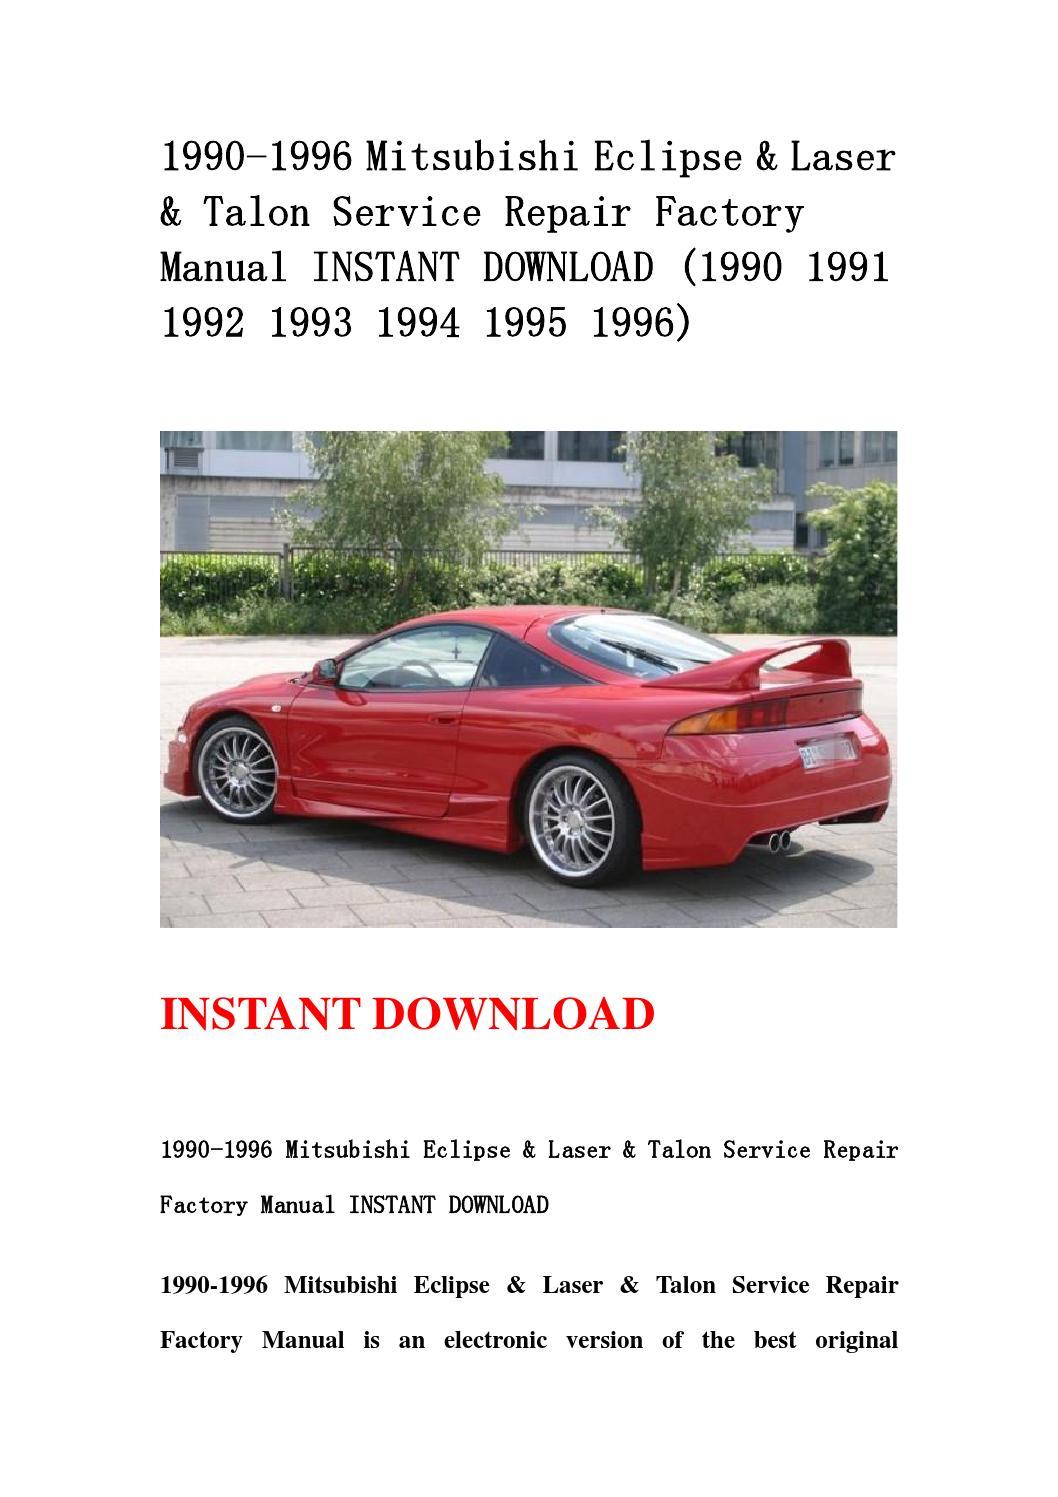 1990 1996 Mitsubishi Eclipse  U0026 Laser  U0026 Talon Service